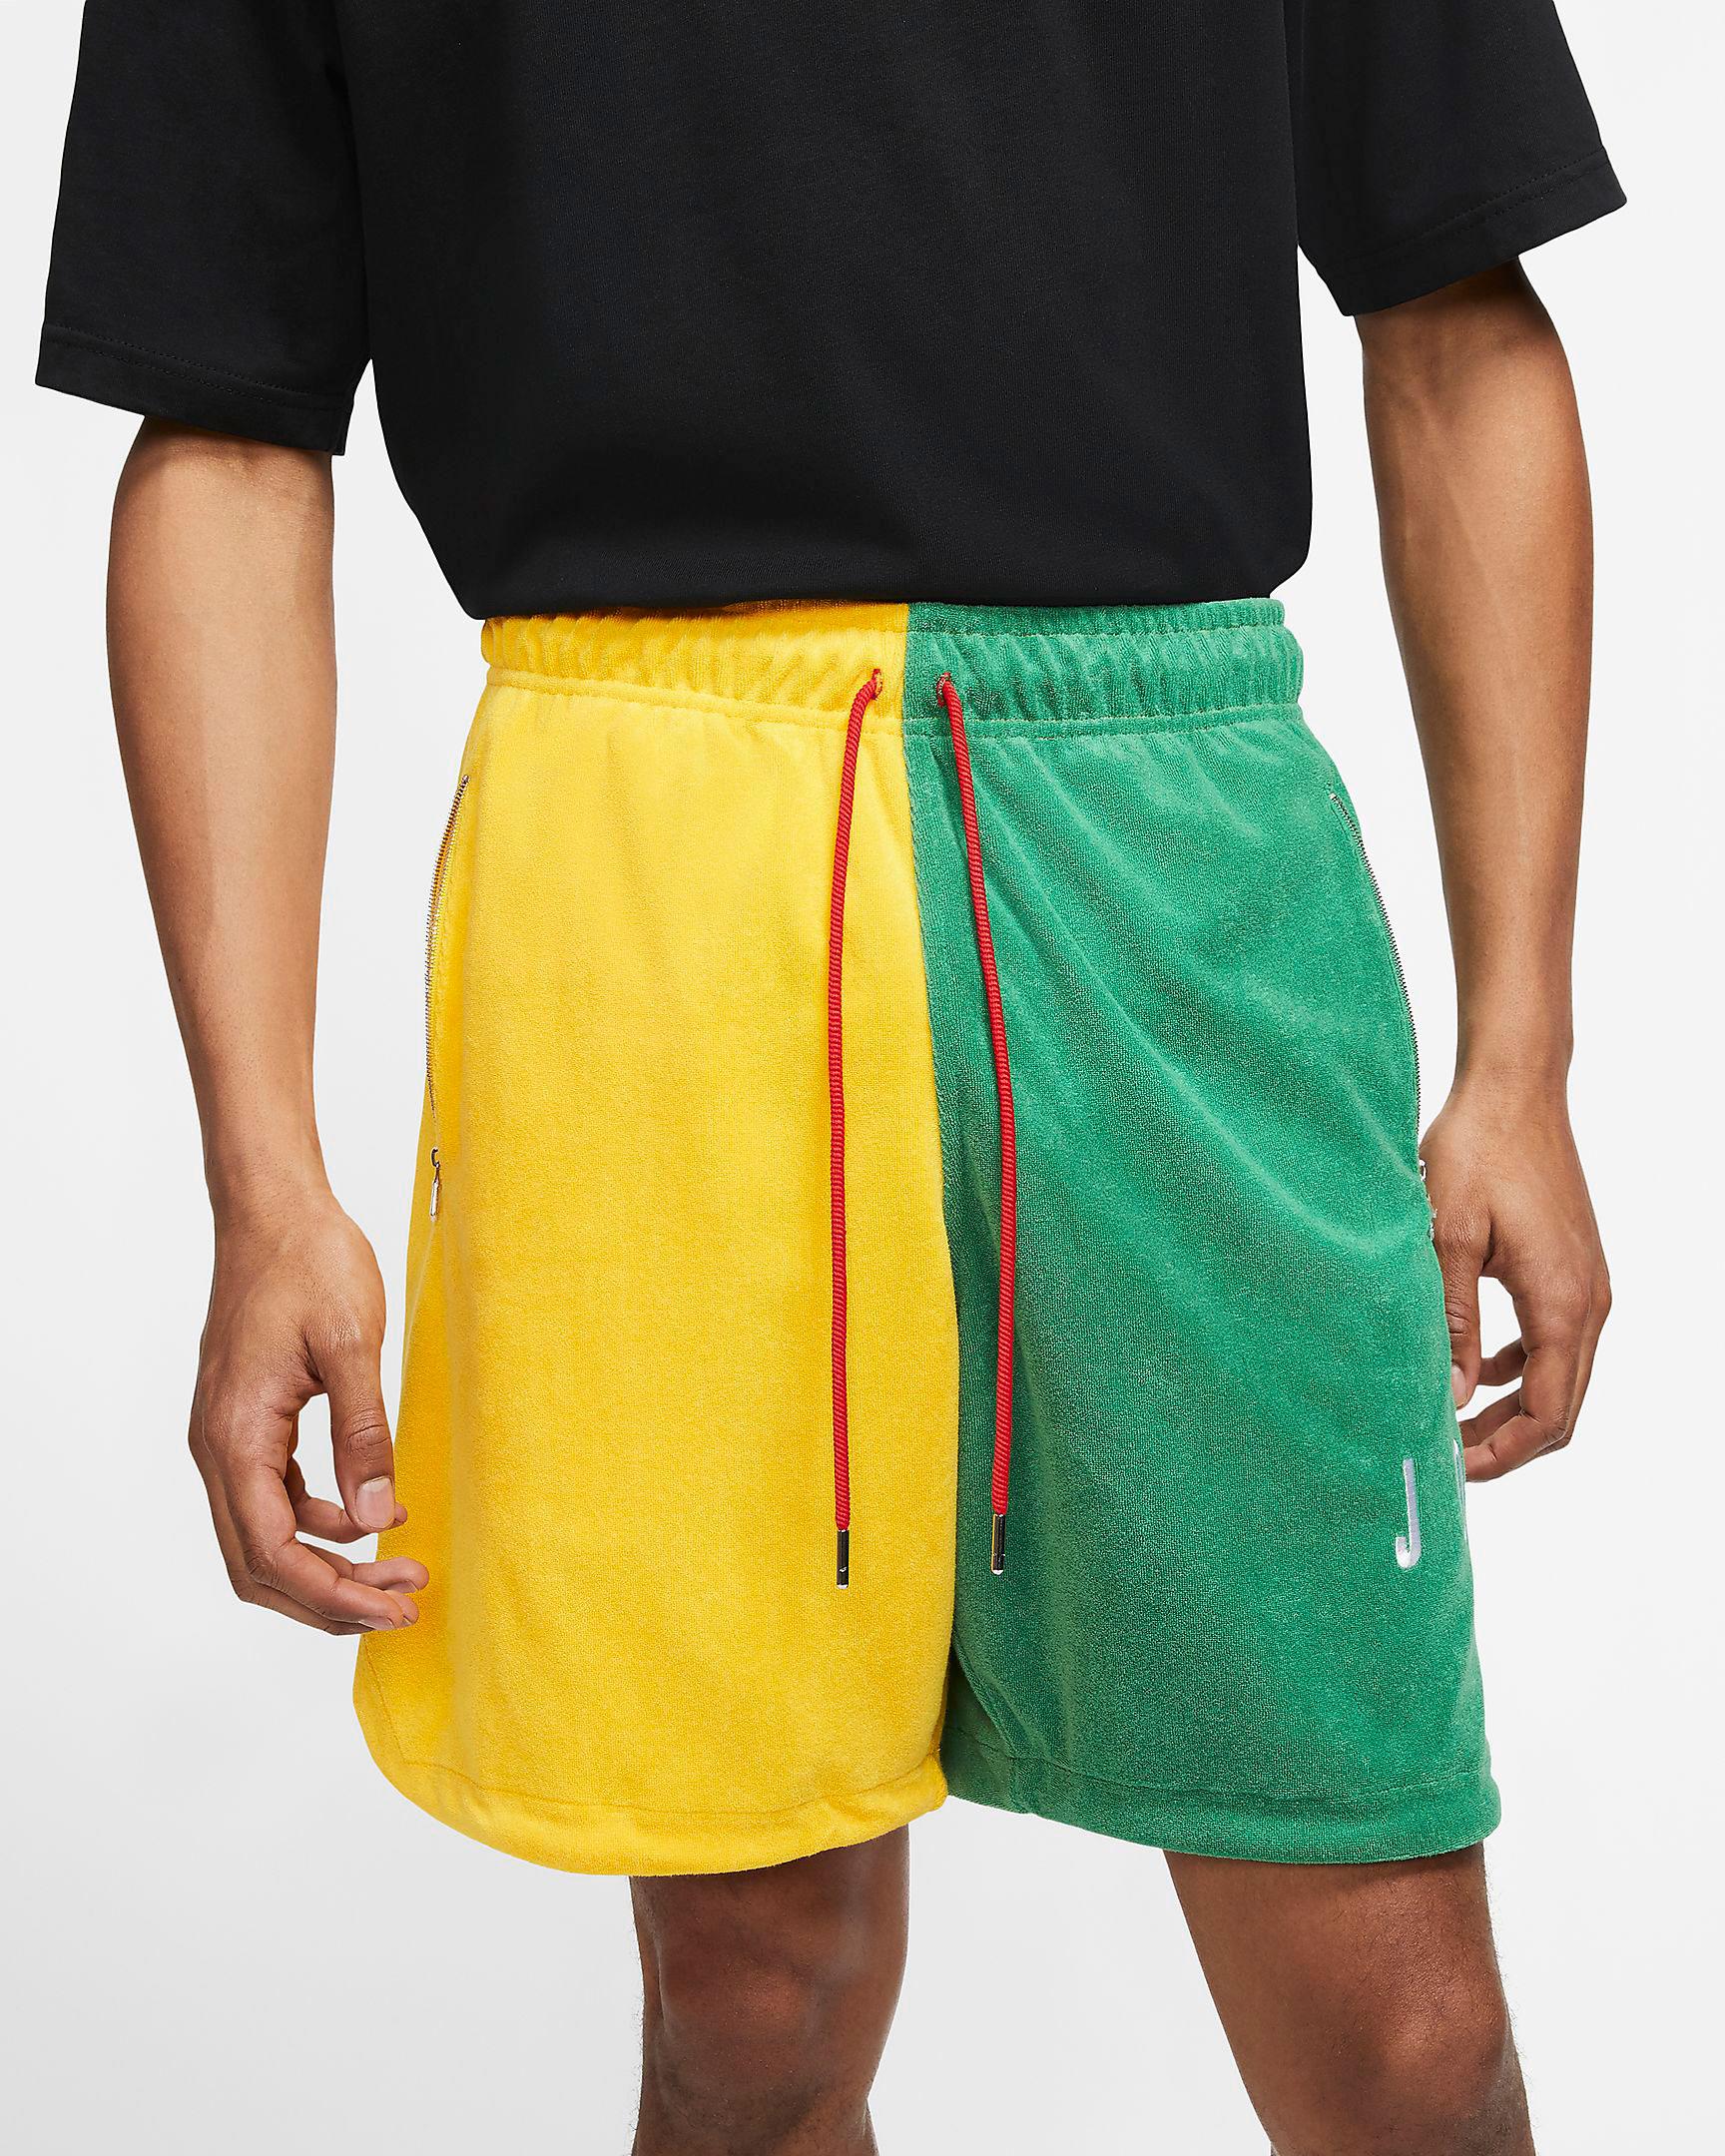 shorts-to-match-jordan-6-hare-1